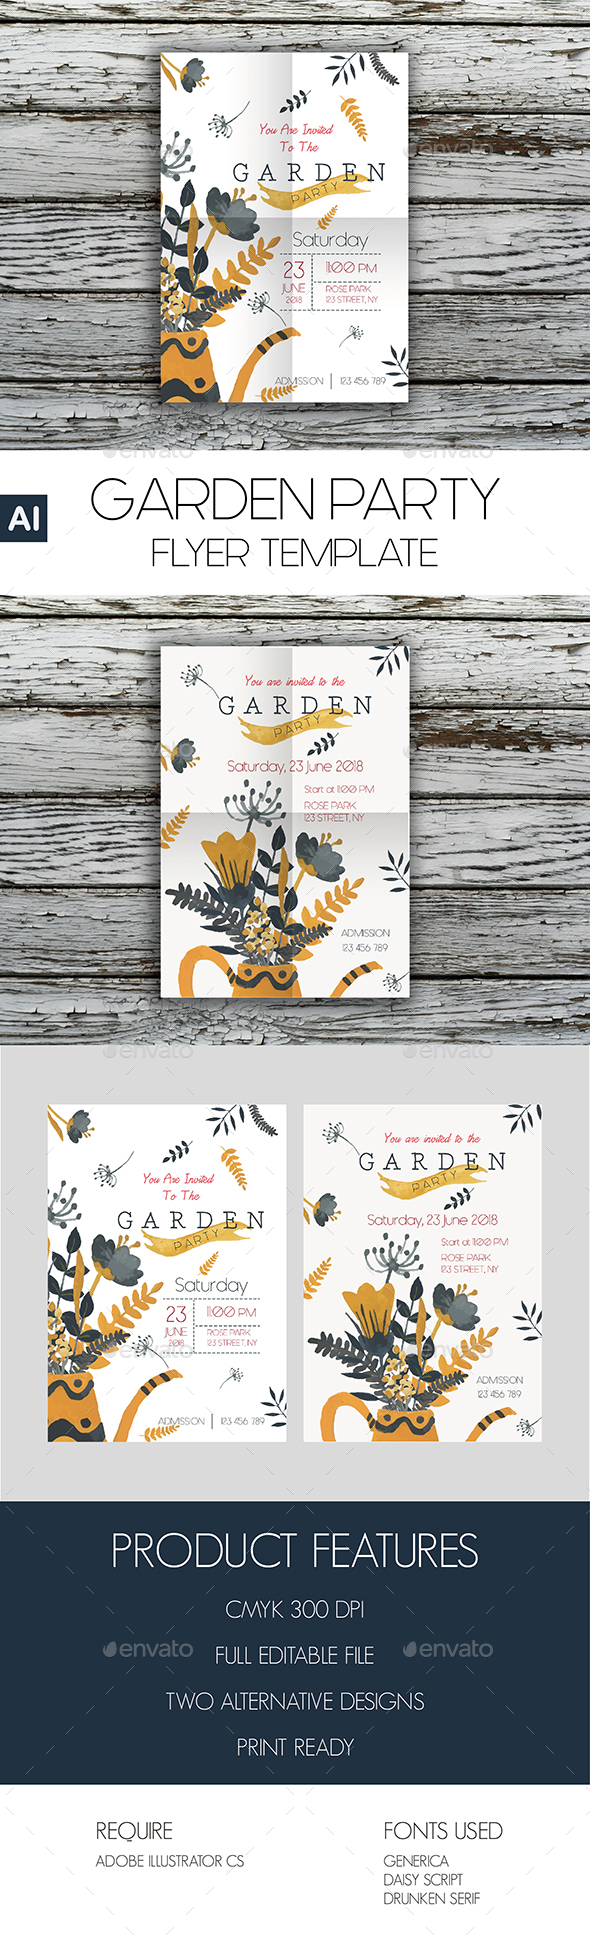 Garden Party Flyer Template - Flyers Print Templates